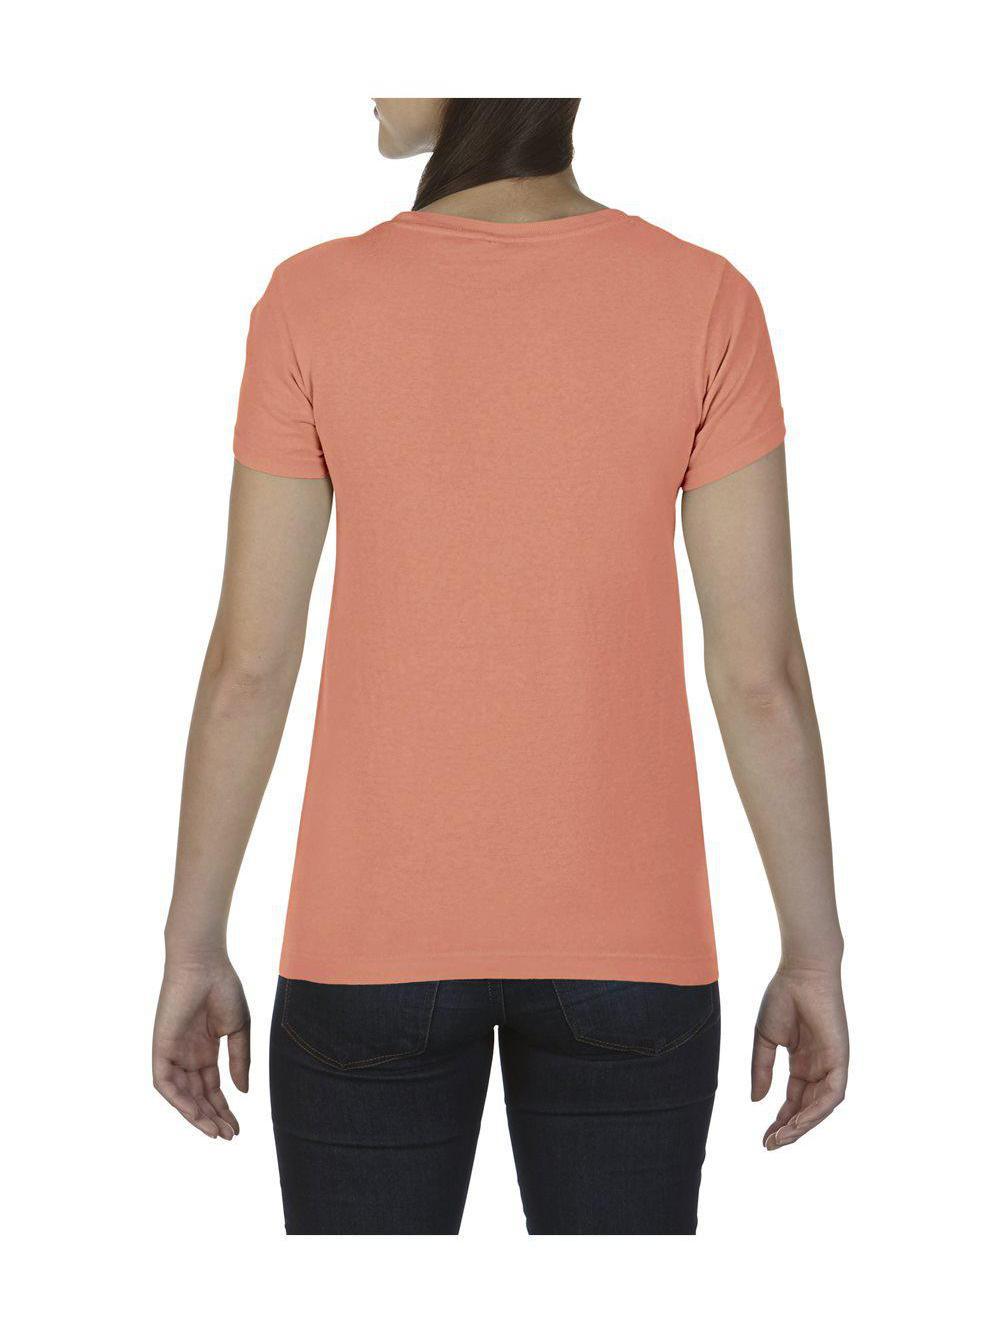 Comfort-Colors-Pigment-Dyed-Ringspun-Women-039-s-Short-Sleeve-T-Shirt-3333 thumbnail 28